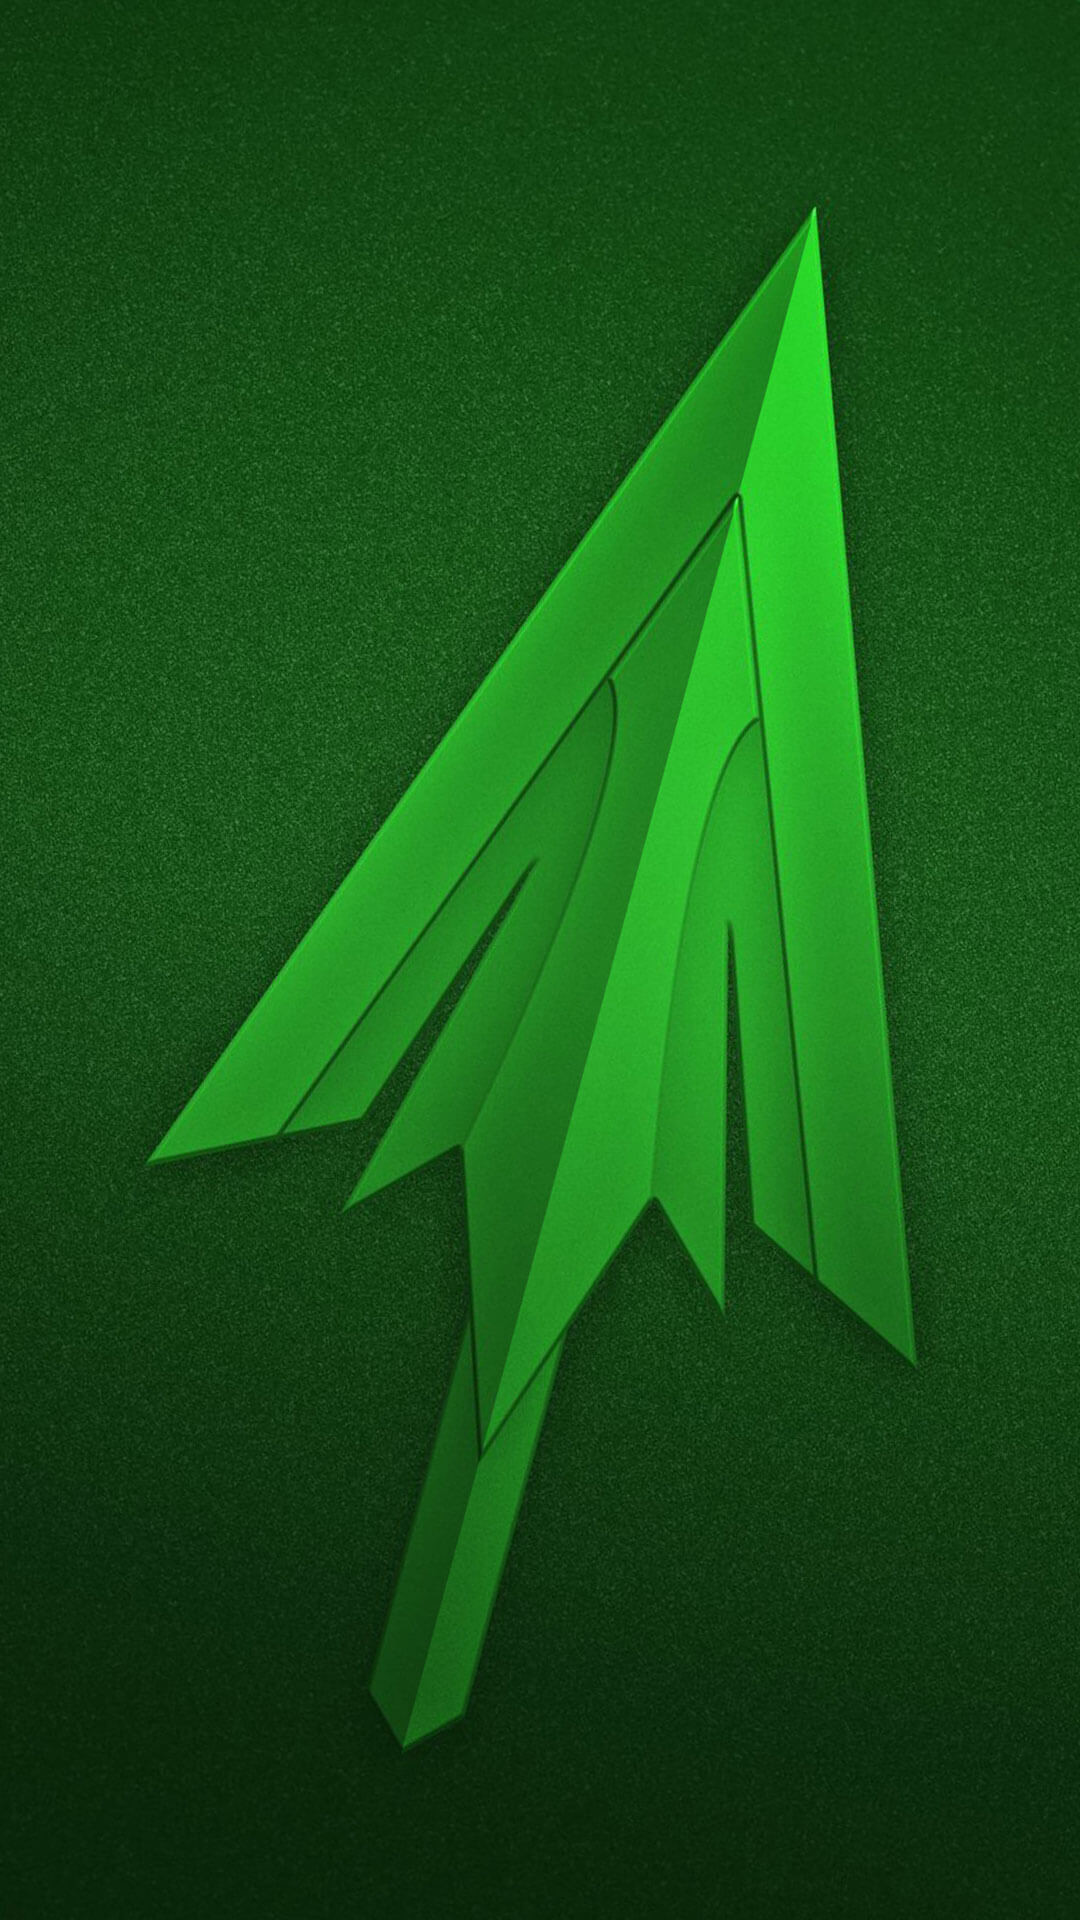 Green Arrow Wallpapers  Wallpaper Cave